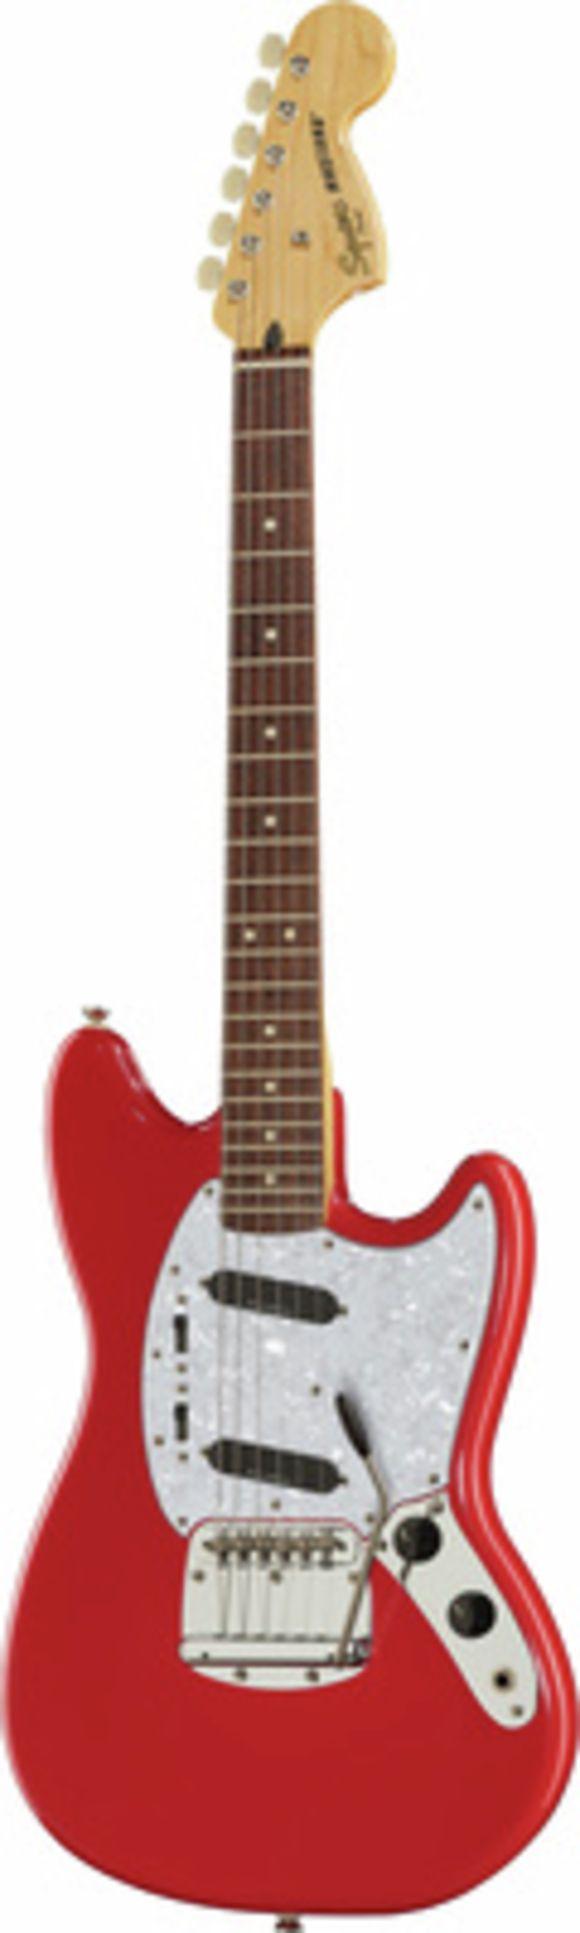 SQ Vintage Mod Mustang IL FR Fender